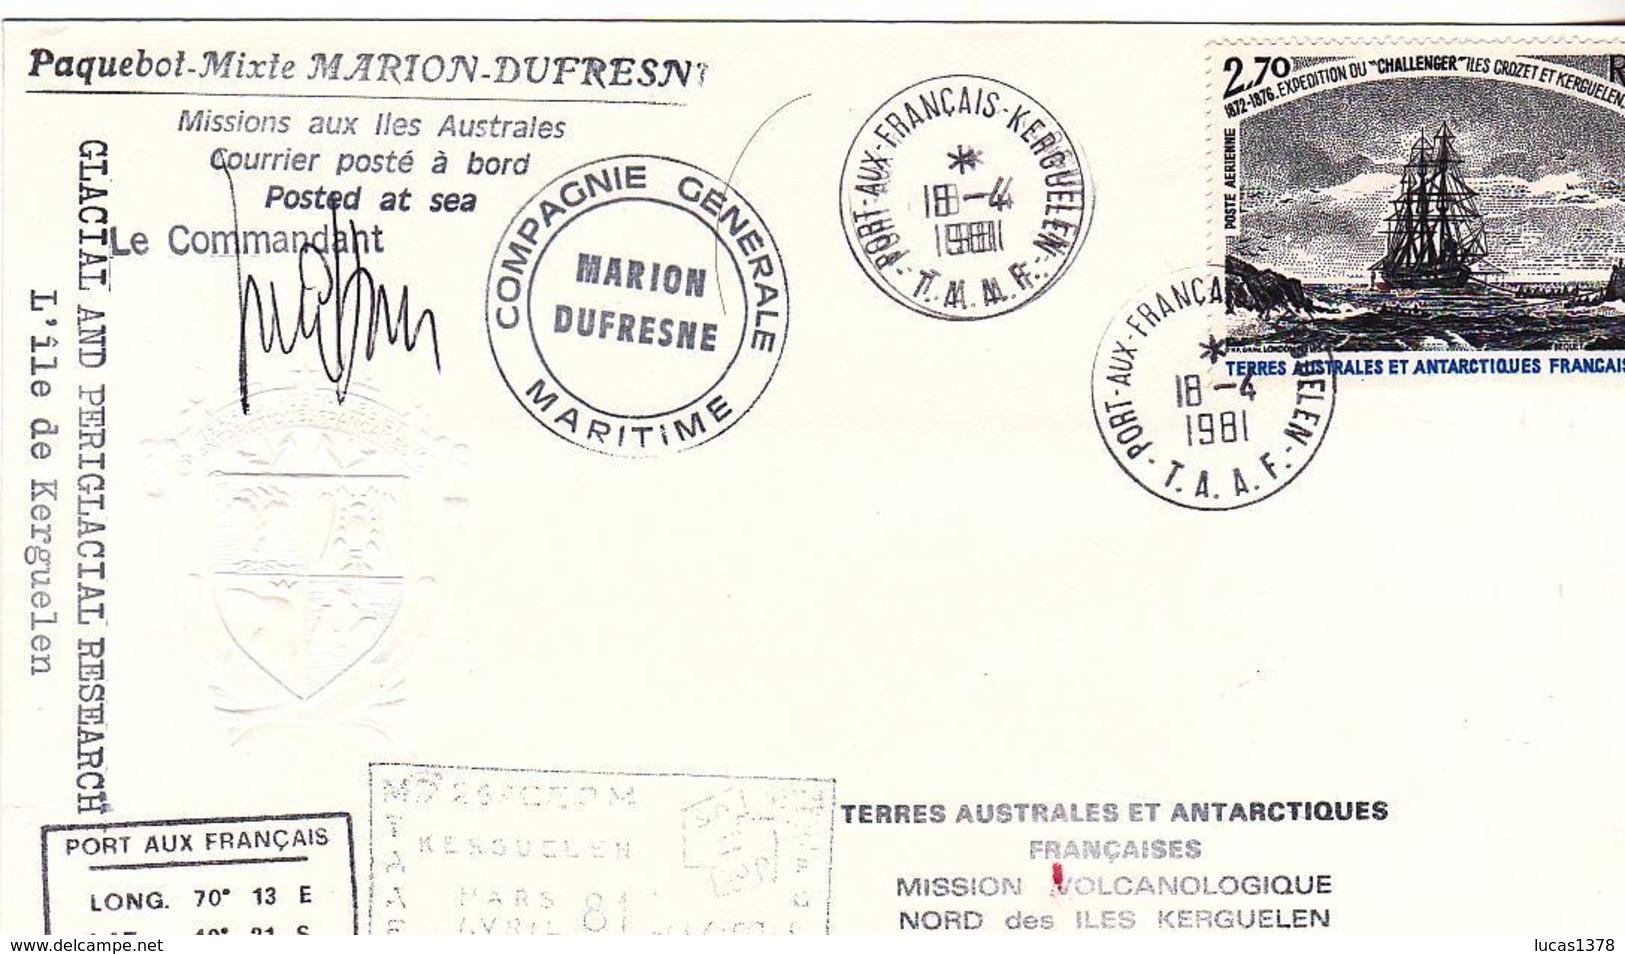 TAAF / PAQUEBOT MIXTE MARION DUFRESNE / MISSION VOLCANOLOGIQUE NORD KERGUELEN / N 53 - Lettres & Documents